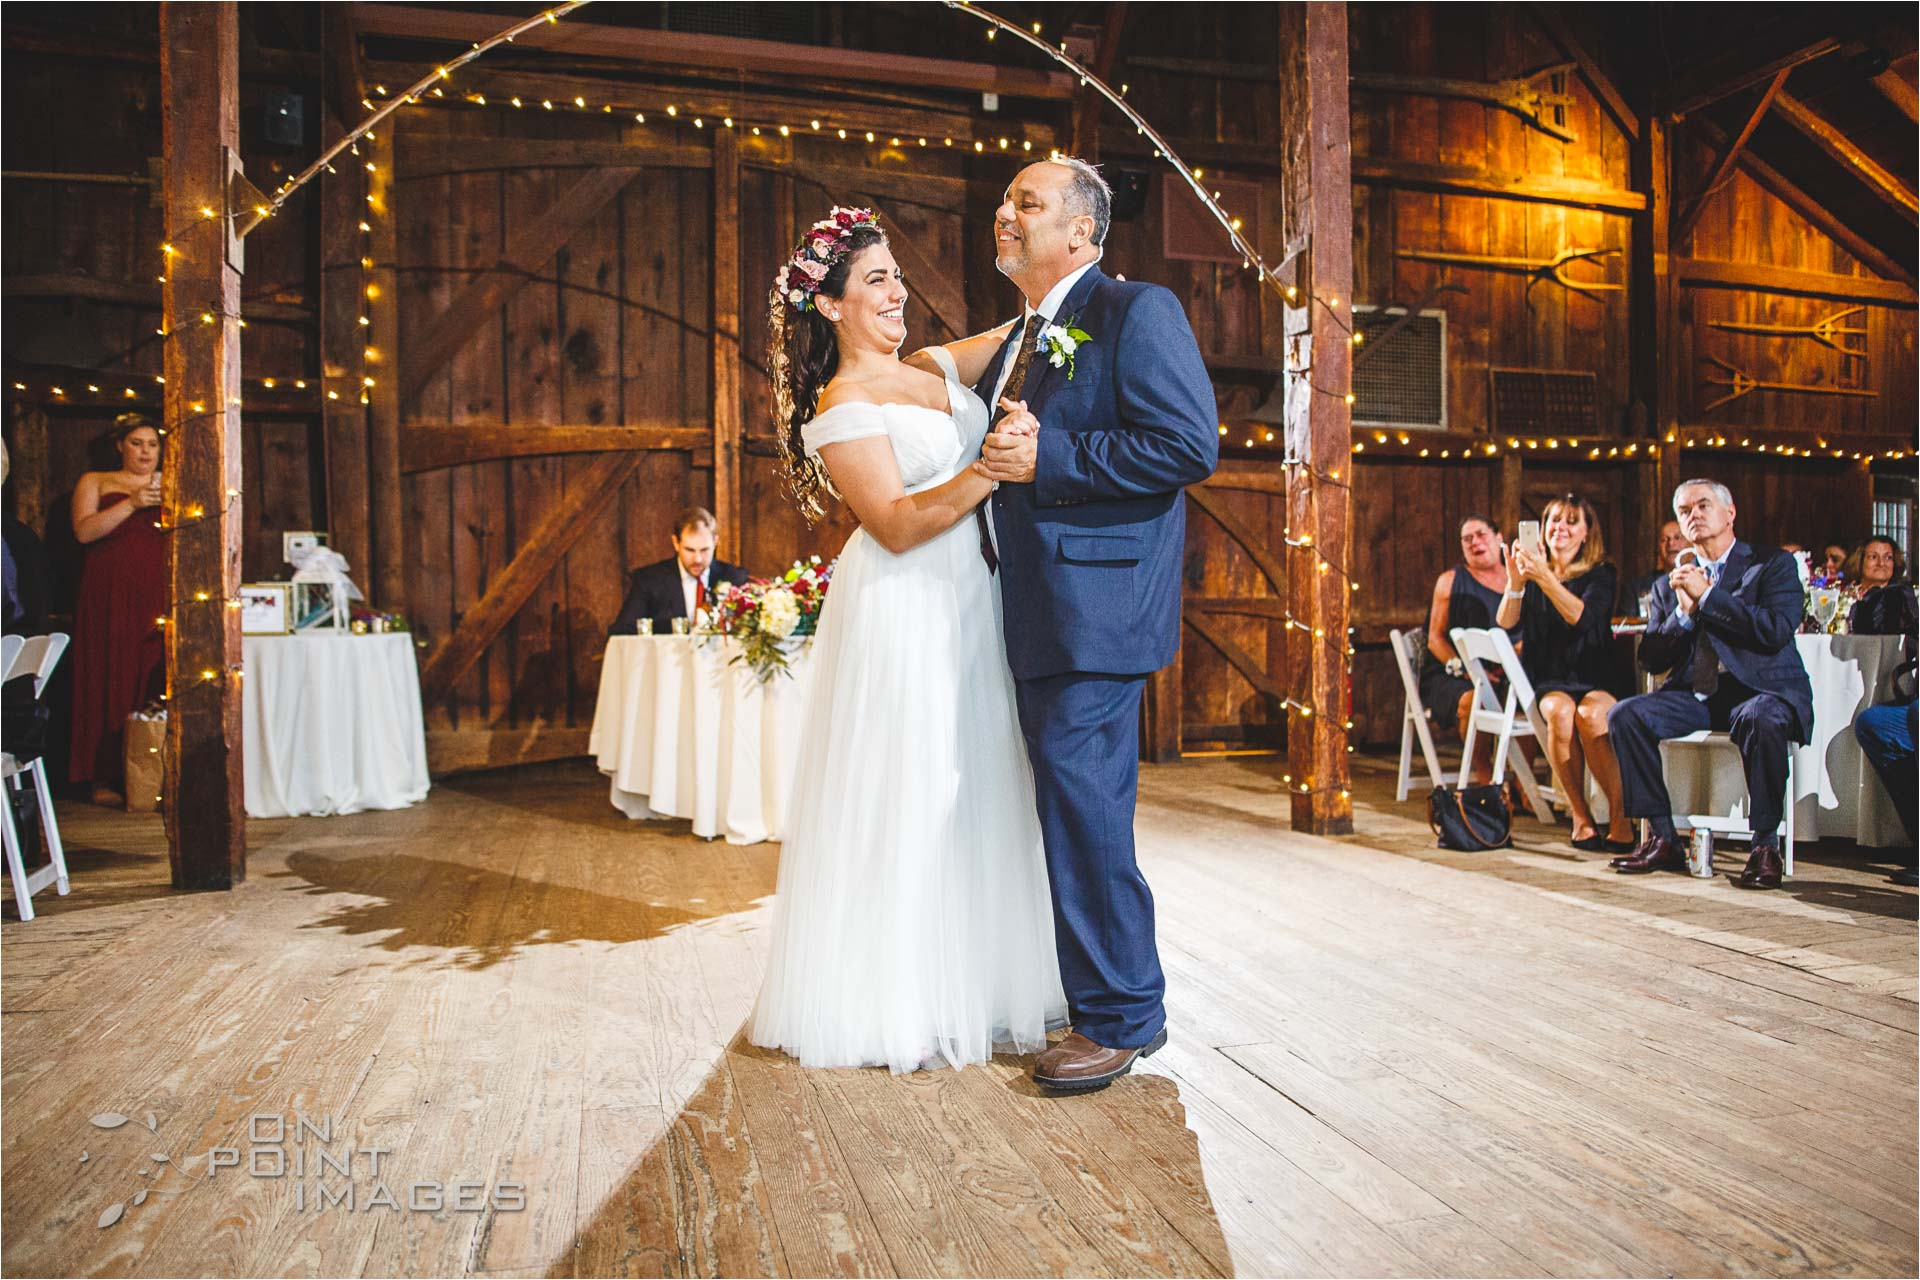 webb-barn-wedding-photography-silas-robbins-house-31.jpg